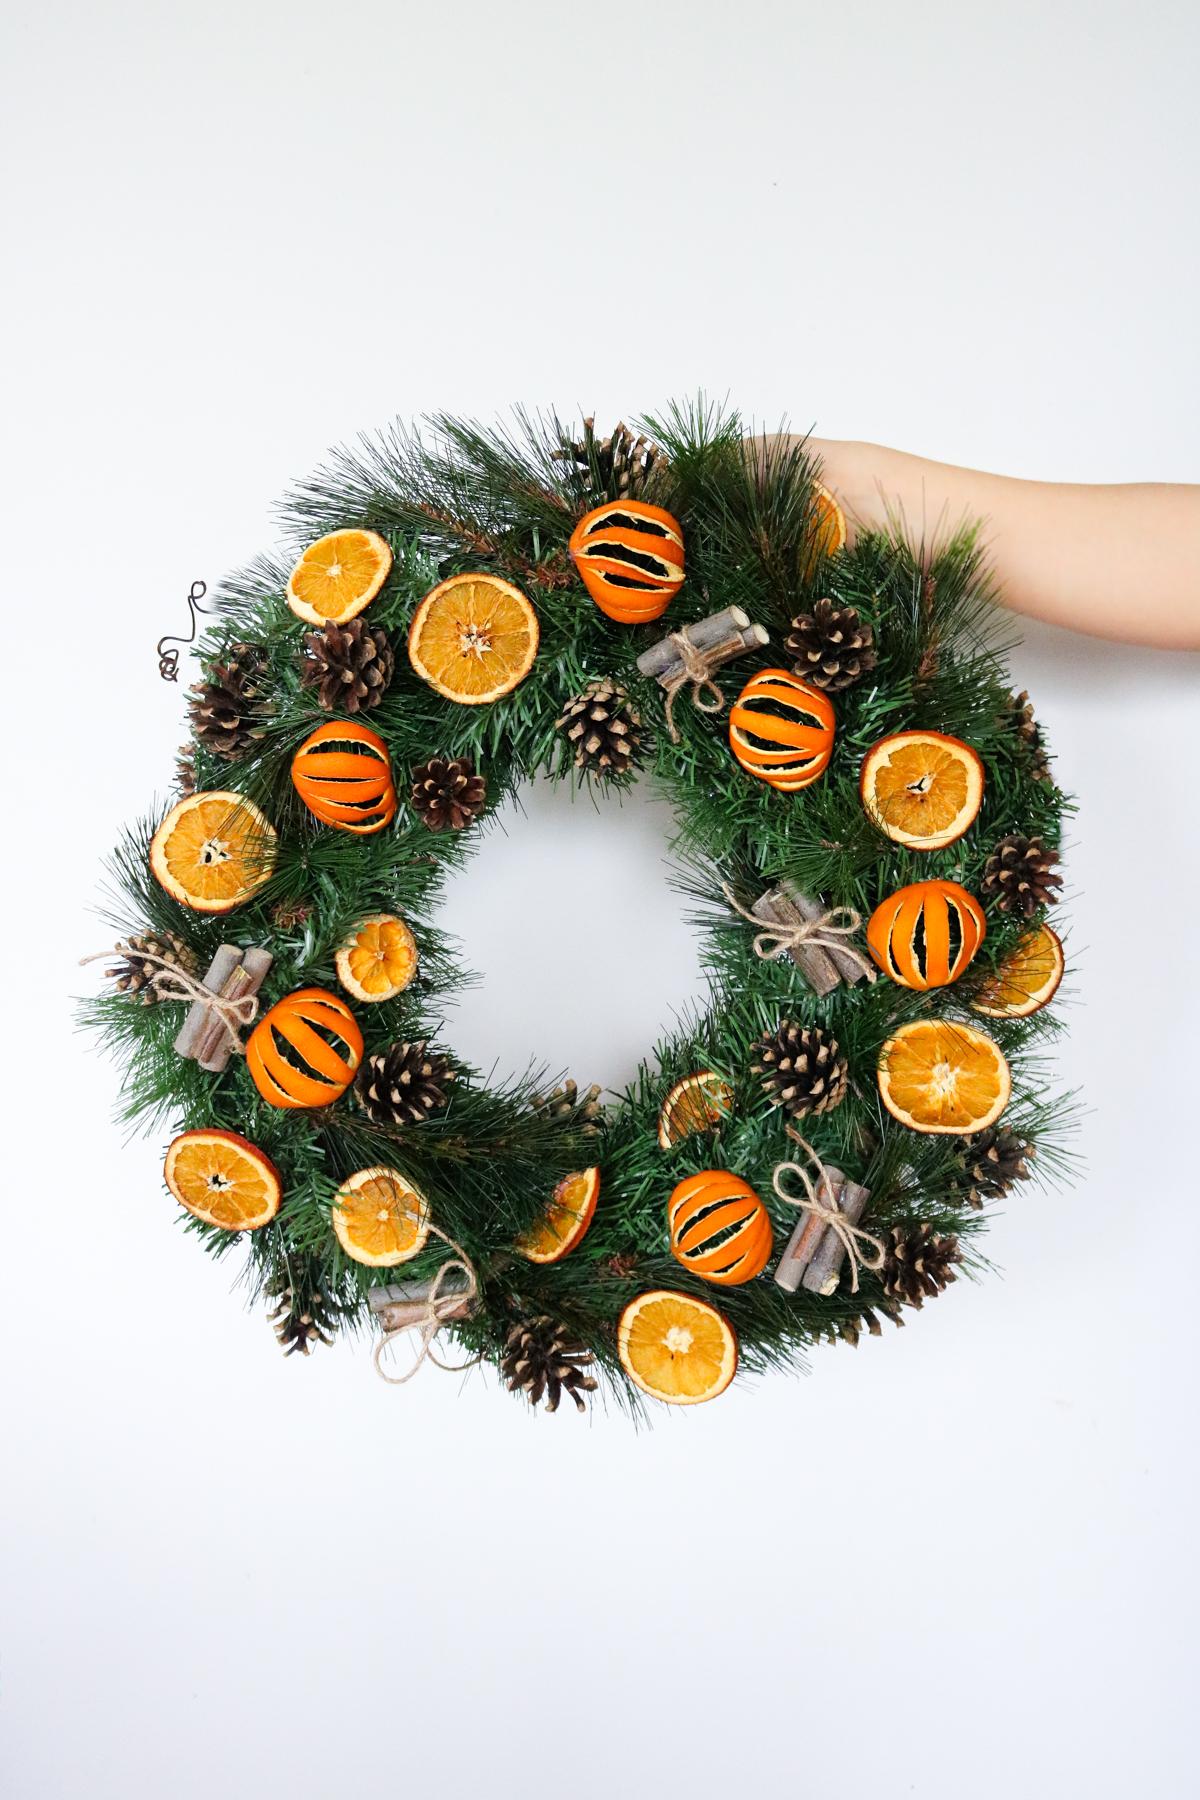 DIY citrus wreath against a white background